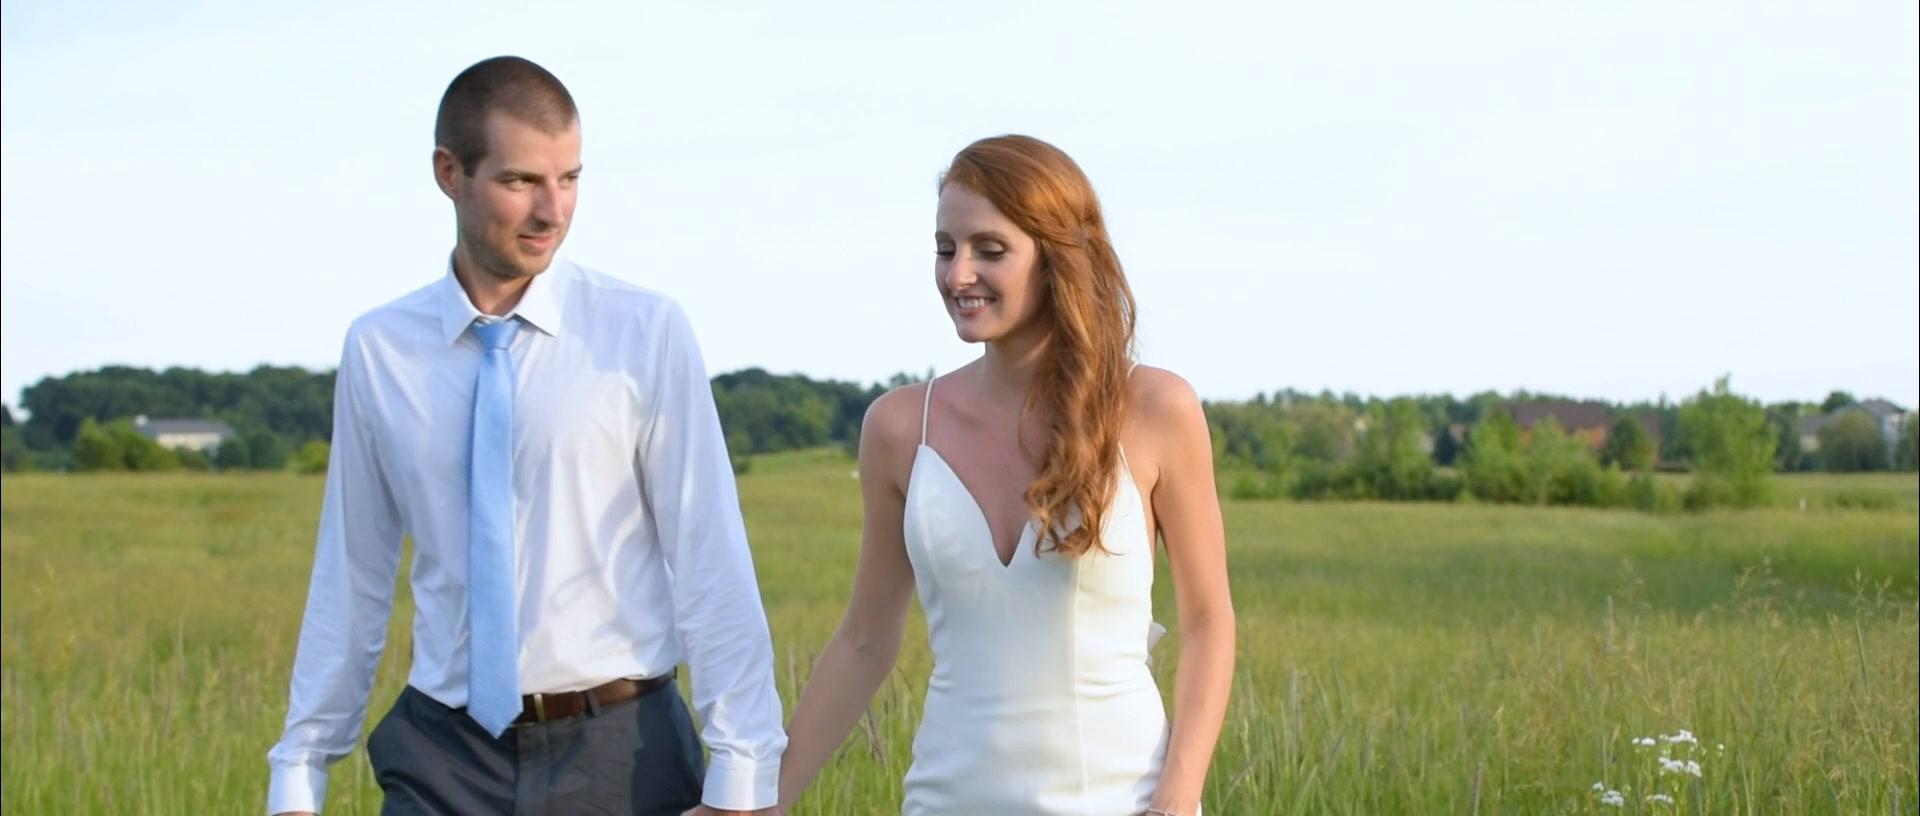 Amber + Graham | Grant, Minnesota | Dellwood Barn